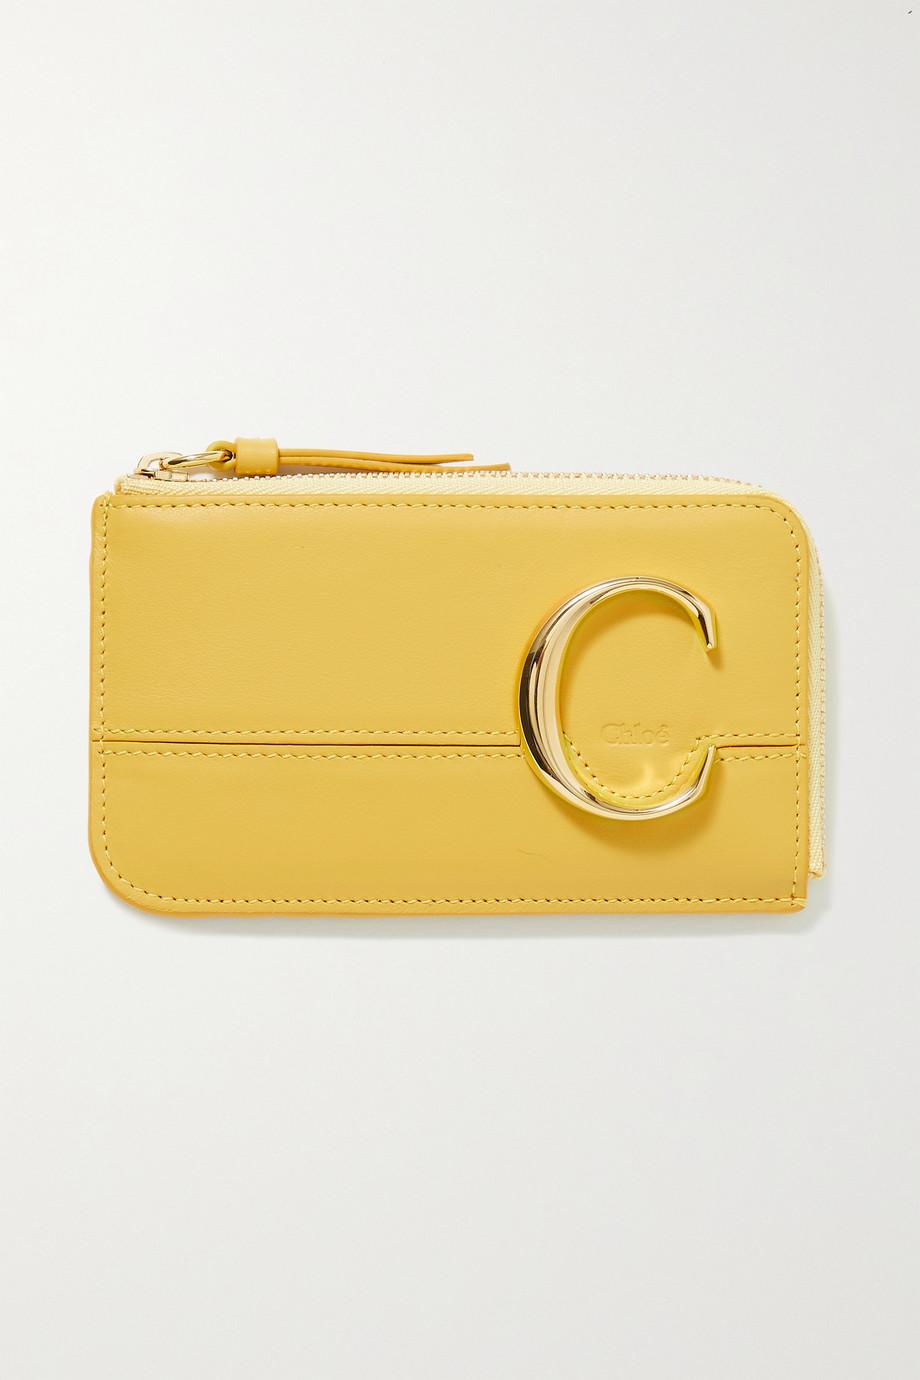 Chloé C leather cardholder